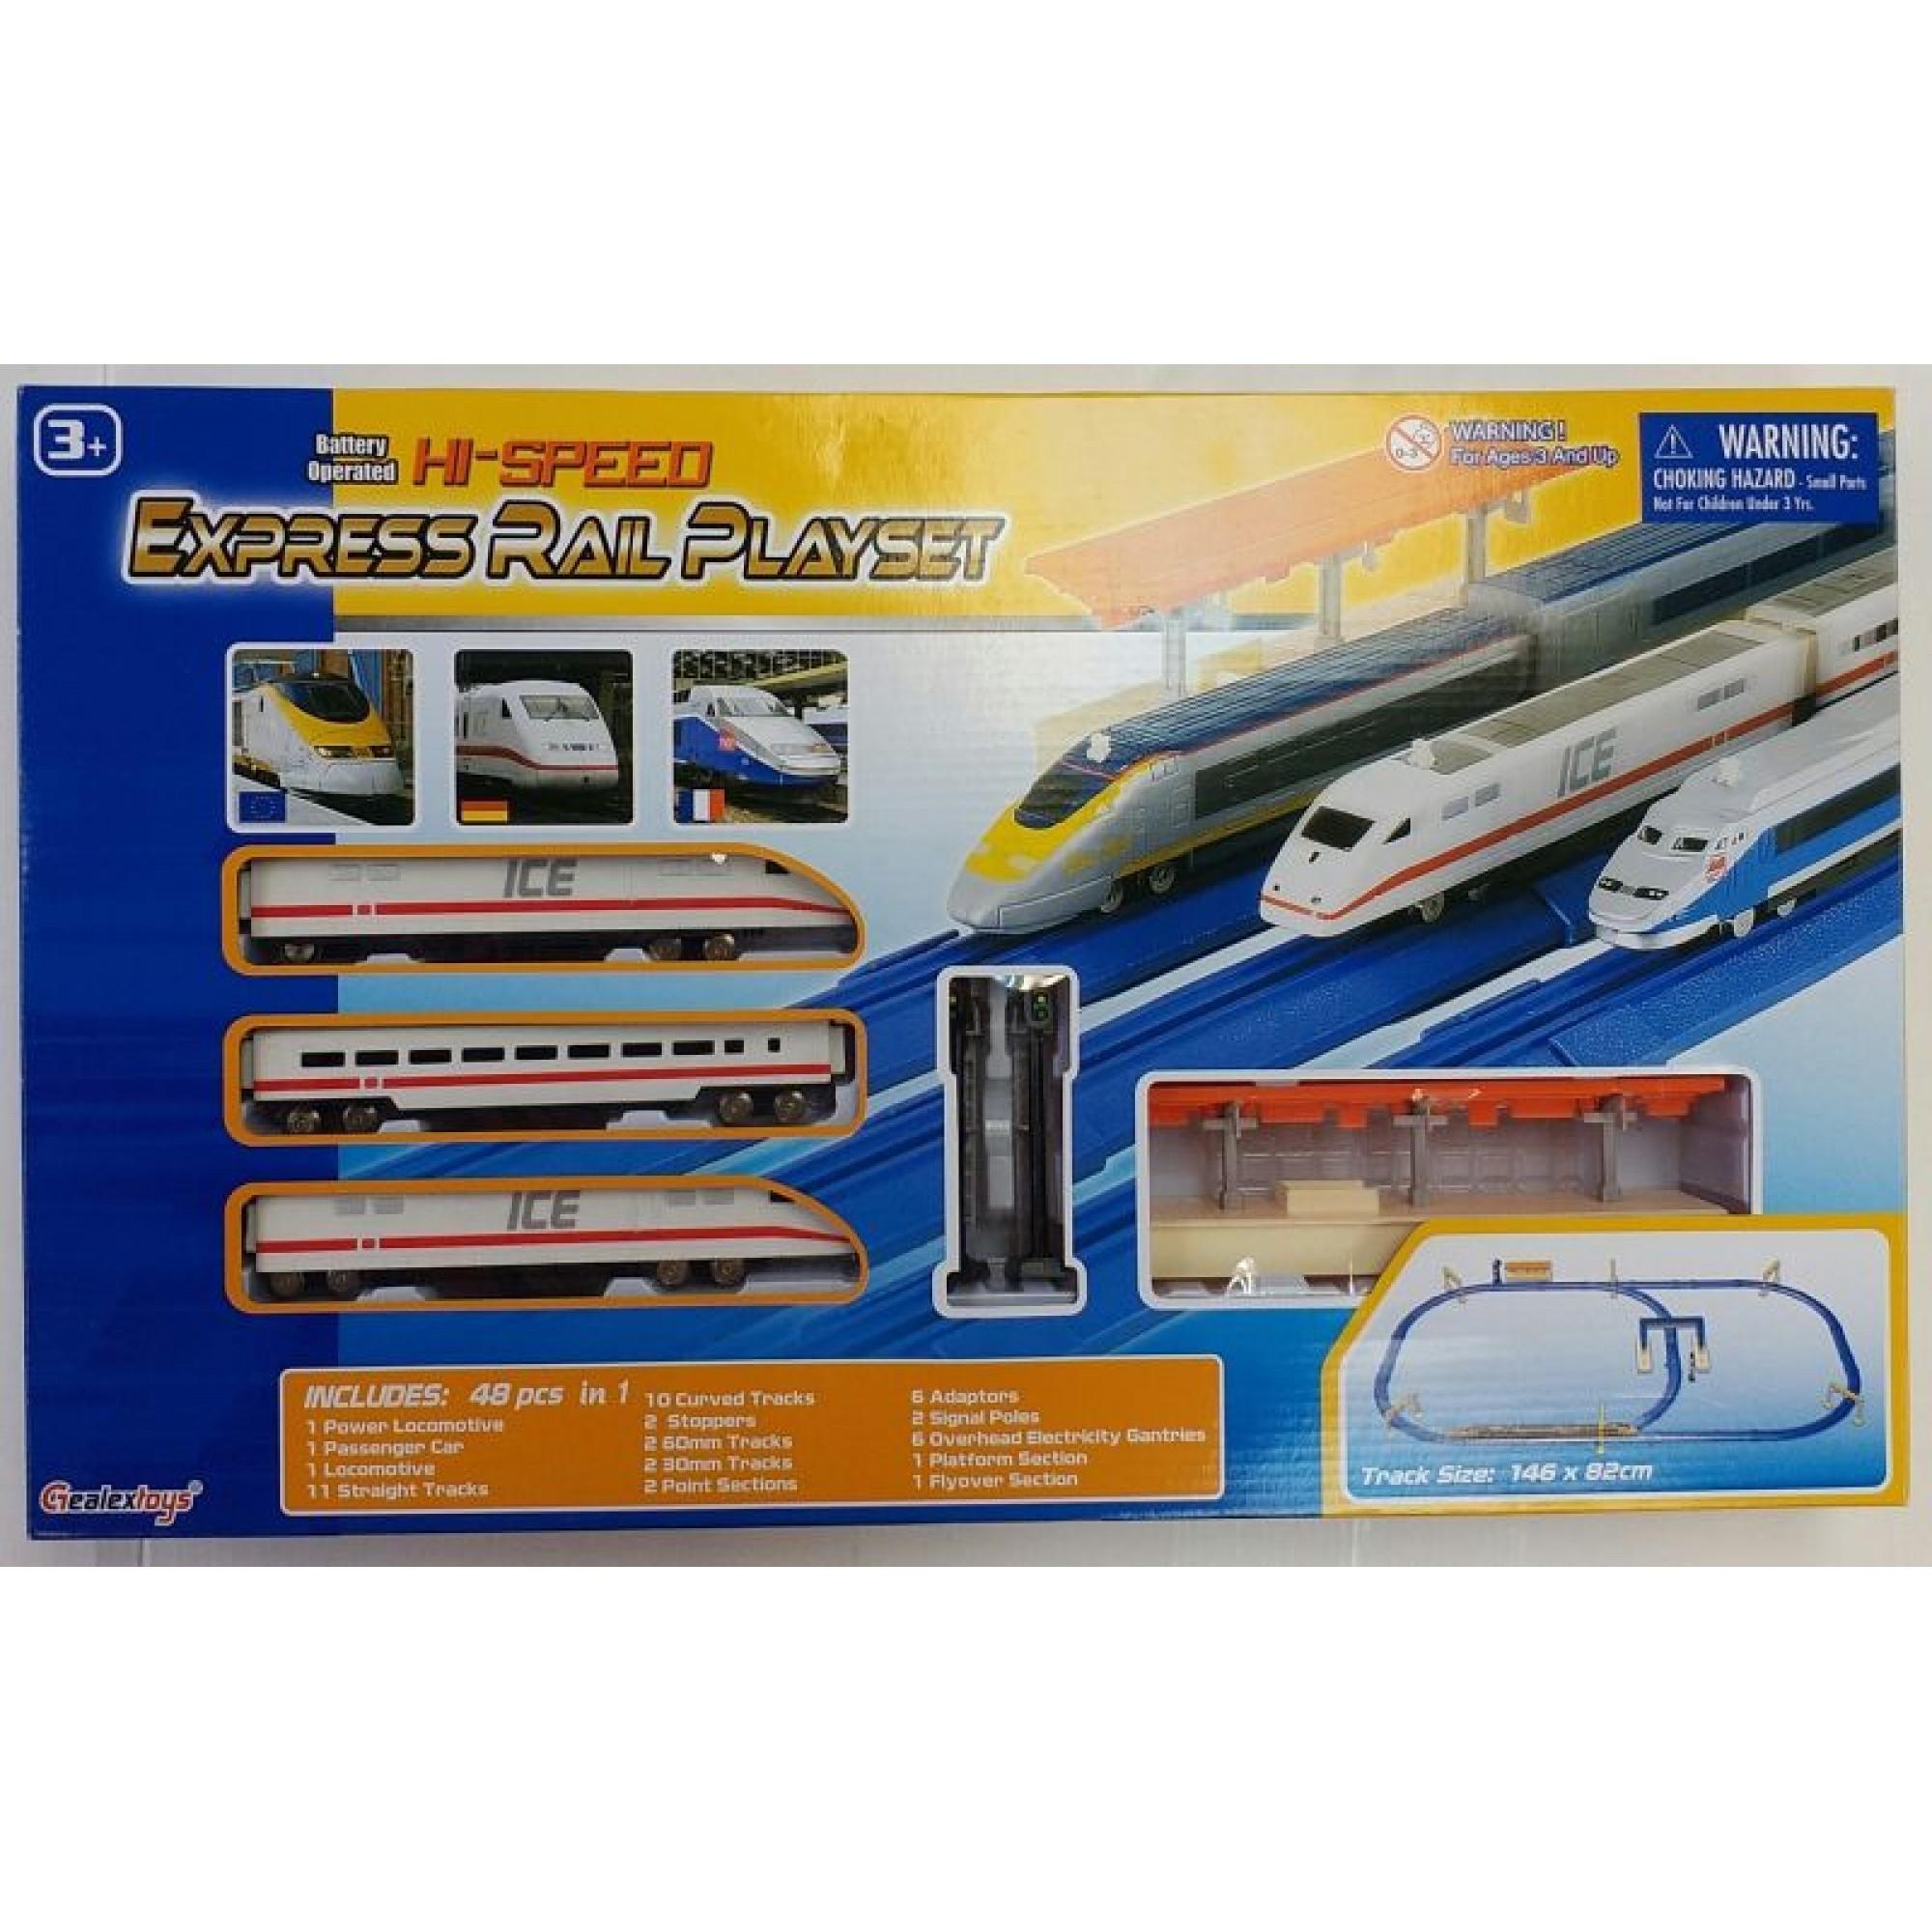 Hi-Speed Express Rail Play Set  - Germany (Medium)